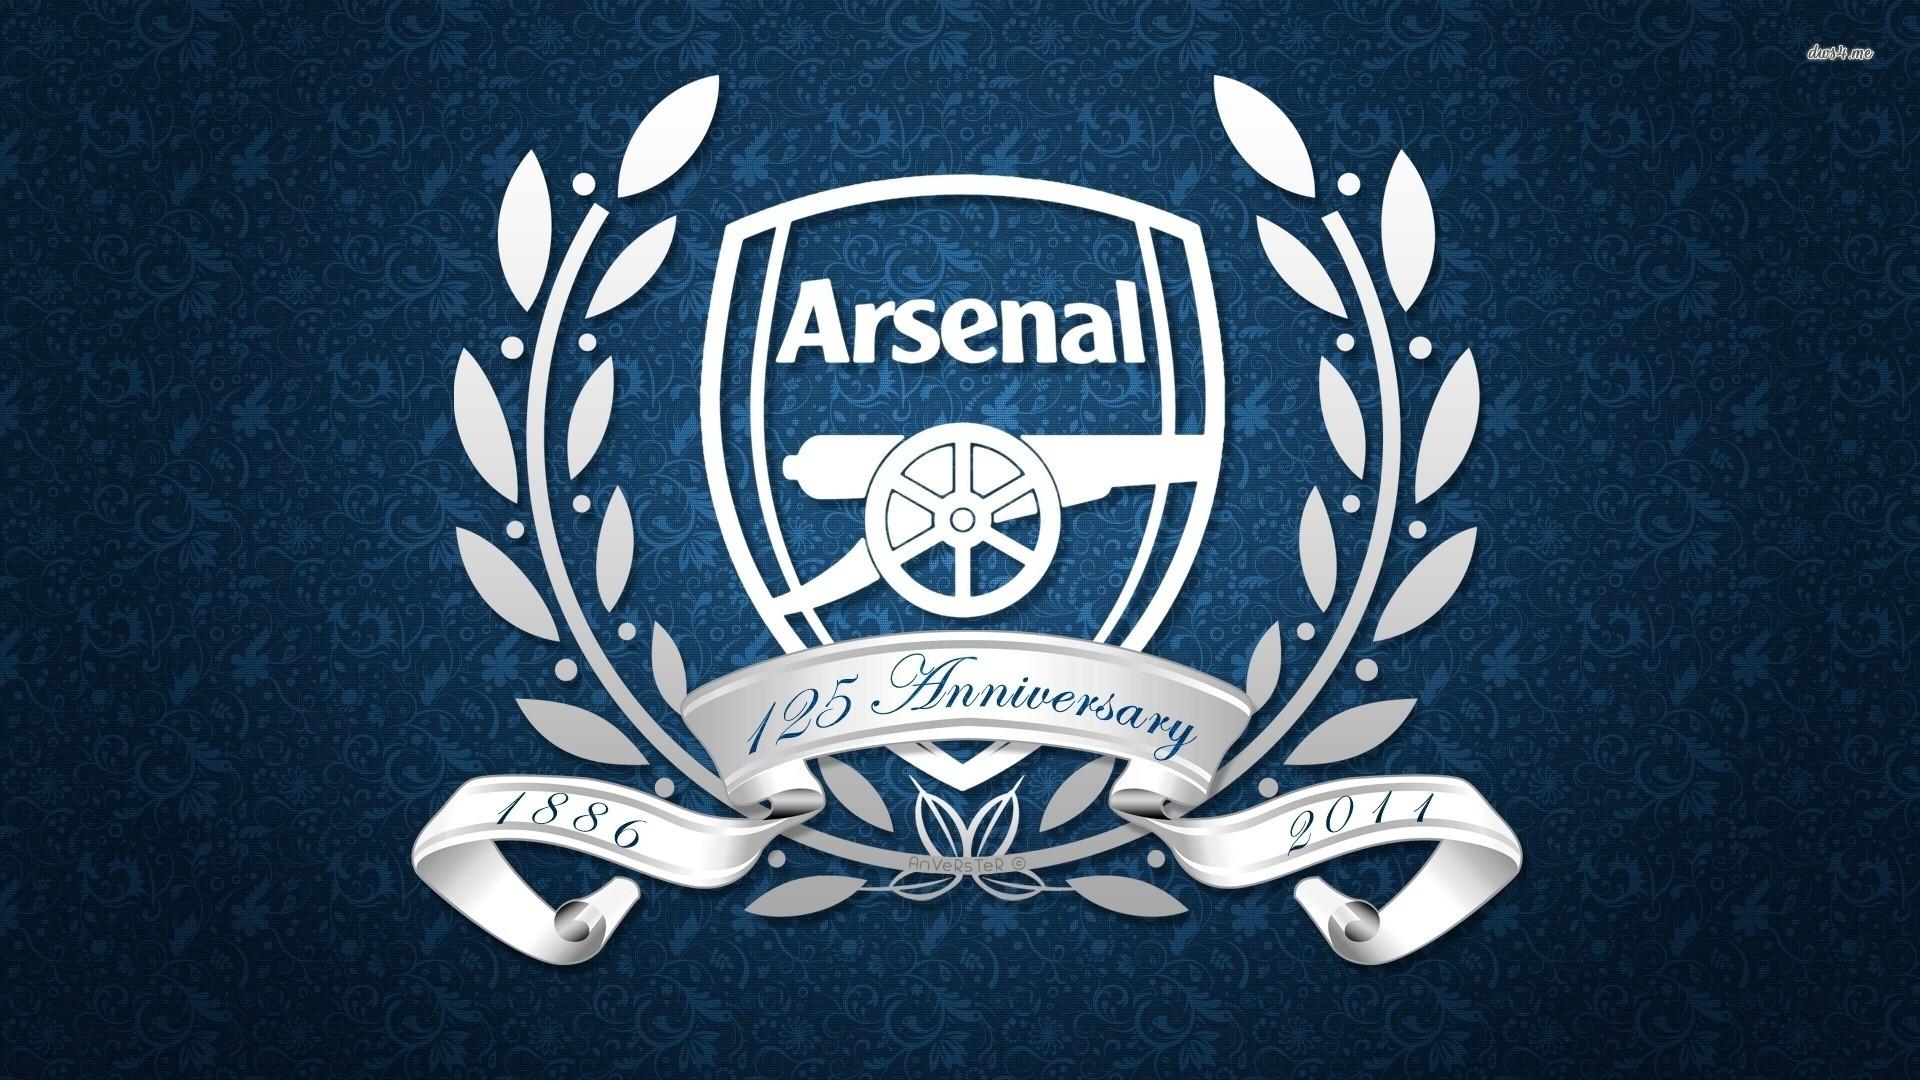 Arsenal logo wallpaper 1280x800 Arsenal logo wallpaper 1366x768 1920x1080